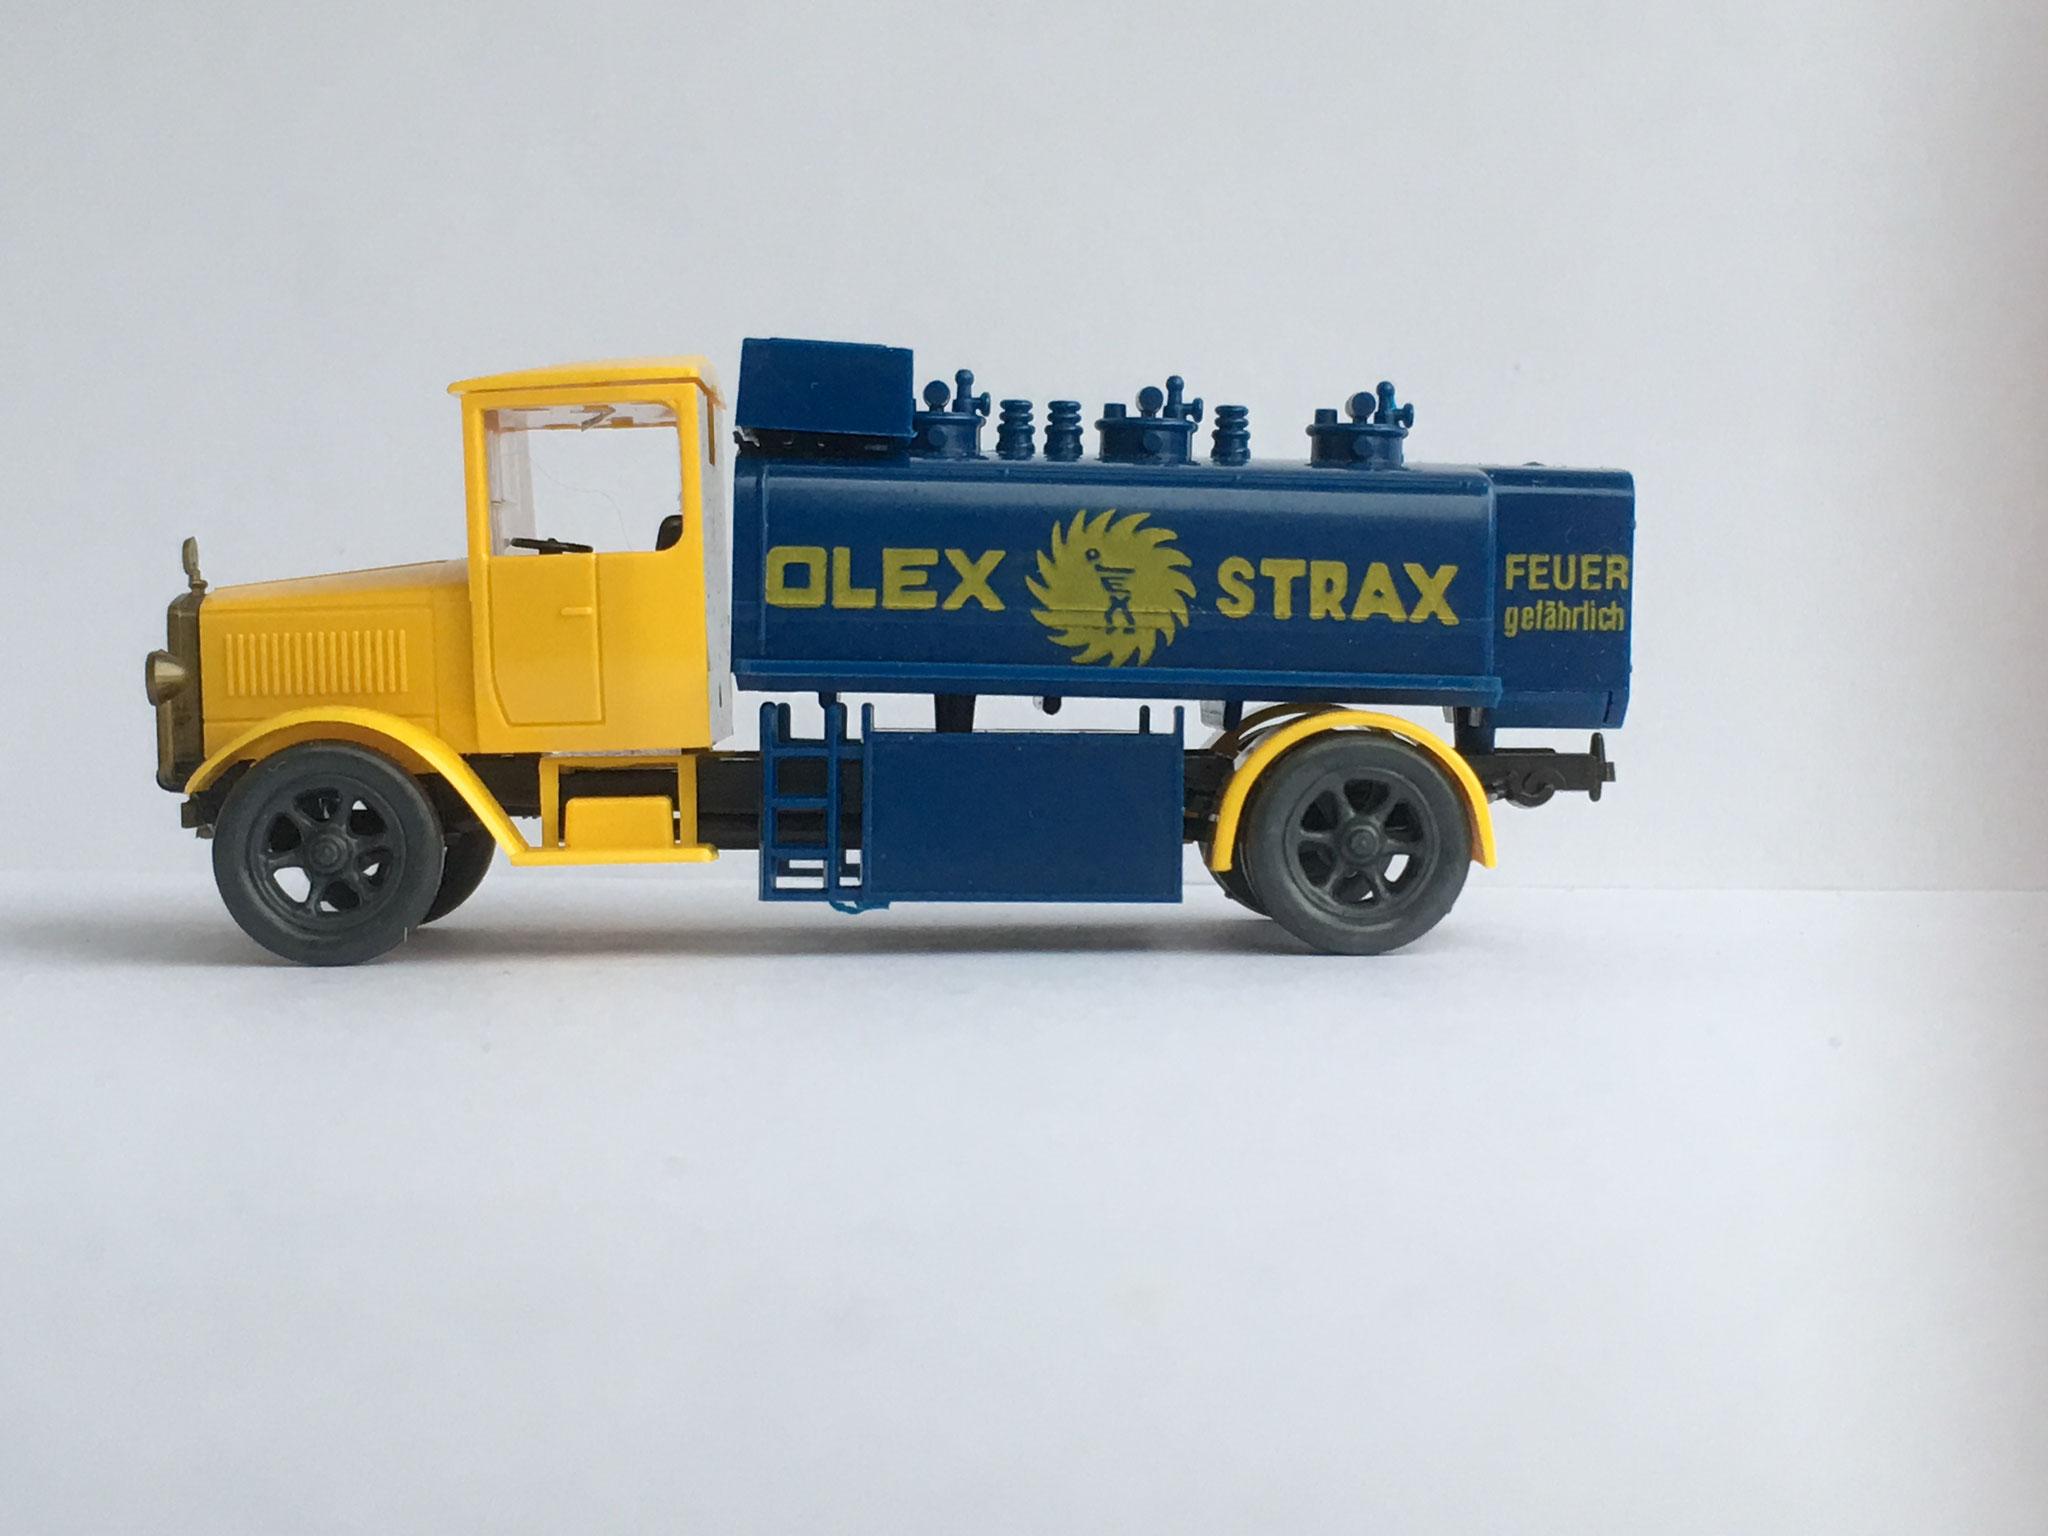 Mercedes L5 Tankwagen OLEX STRAX, Variante 3, Art. Nr. 1017 (ab 1989 im Programm)